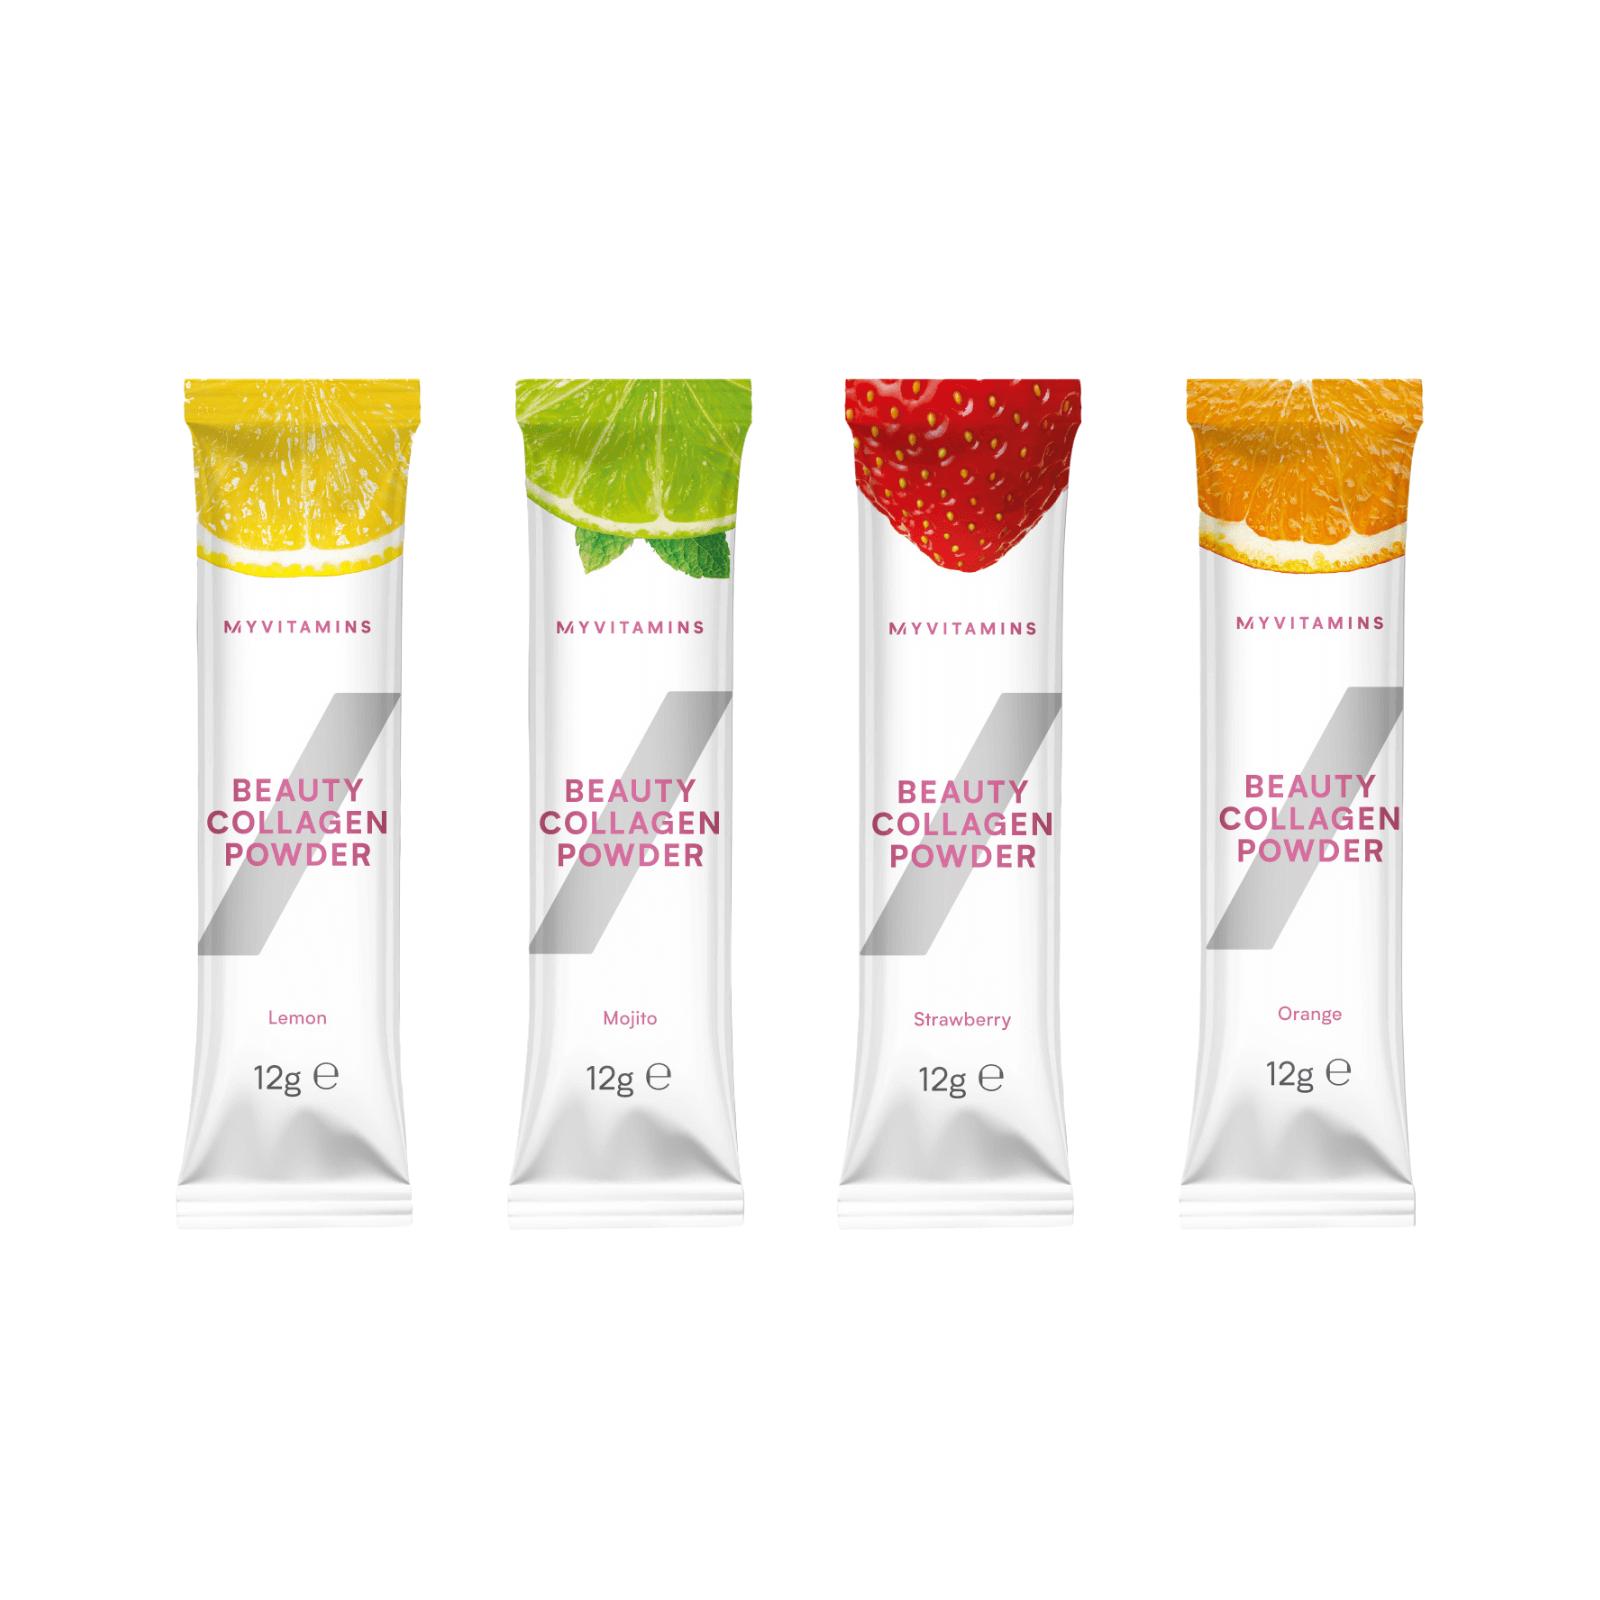 Beauty Collagen Powder Stick Pack (Sample) - 12g - Mojito